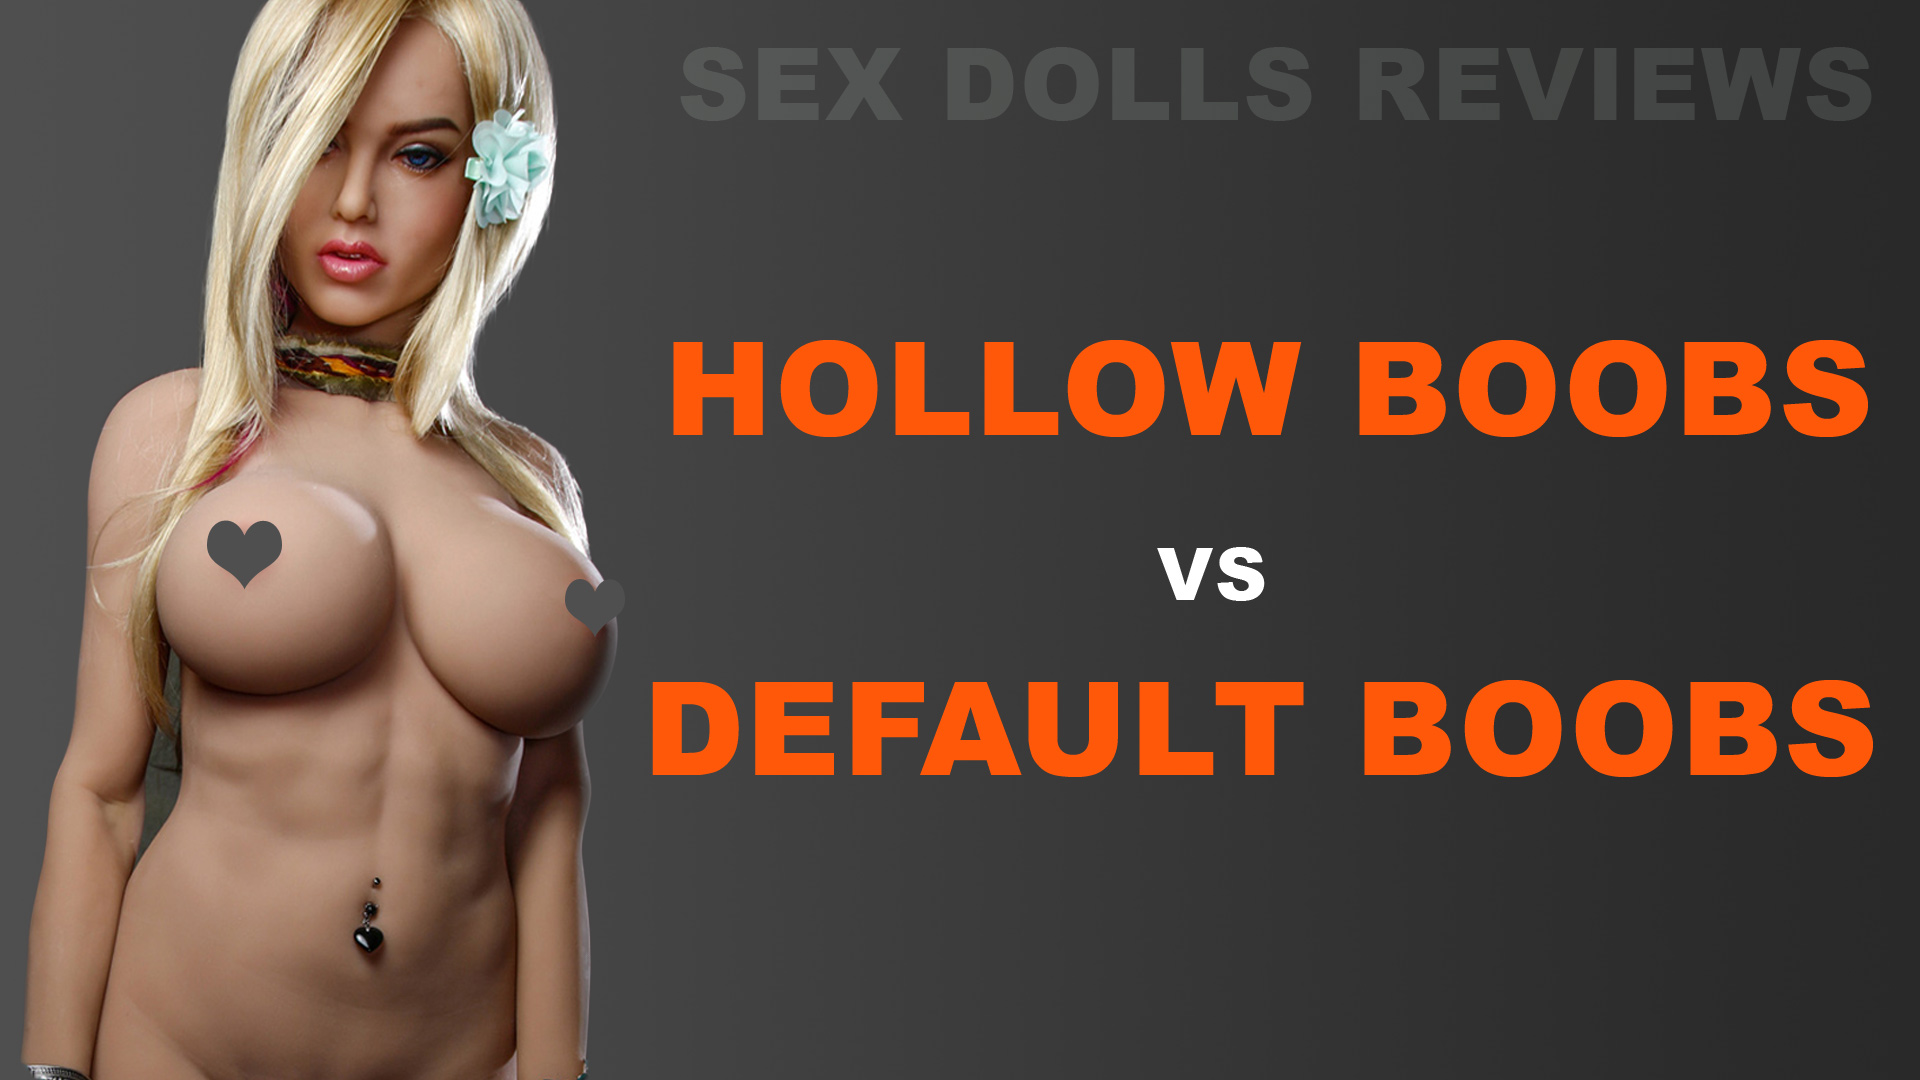 sex dolls hollow boobs review